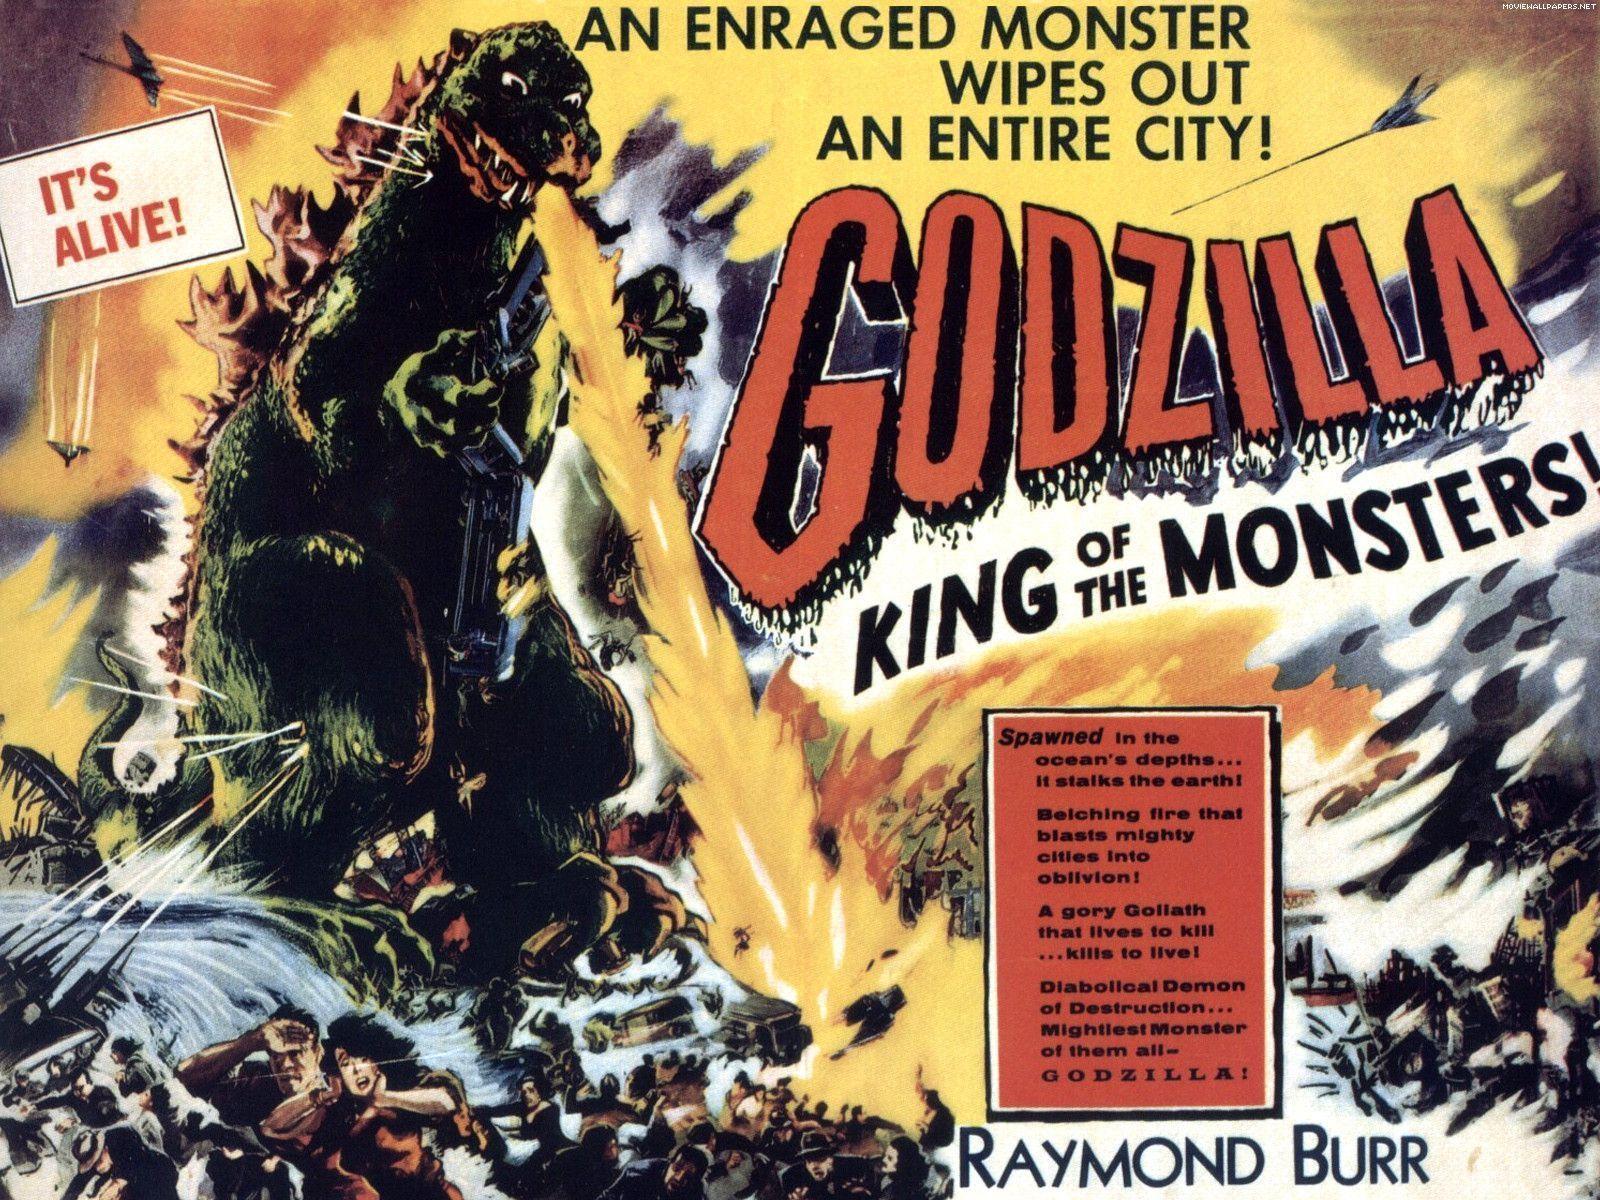 godzilla 1954 wallpaper 22858 hd wallpapers in movies telusers